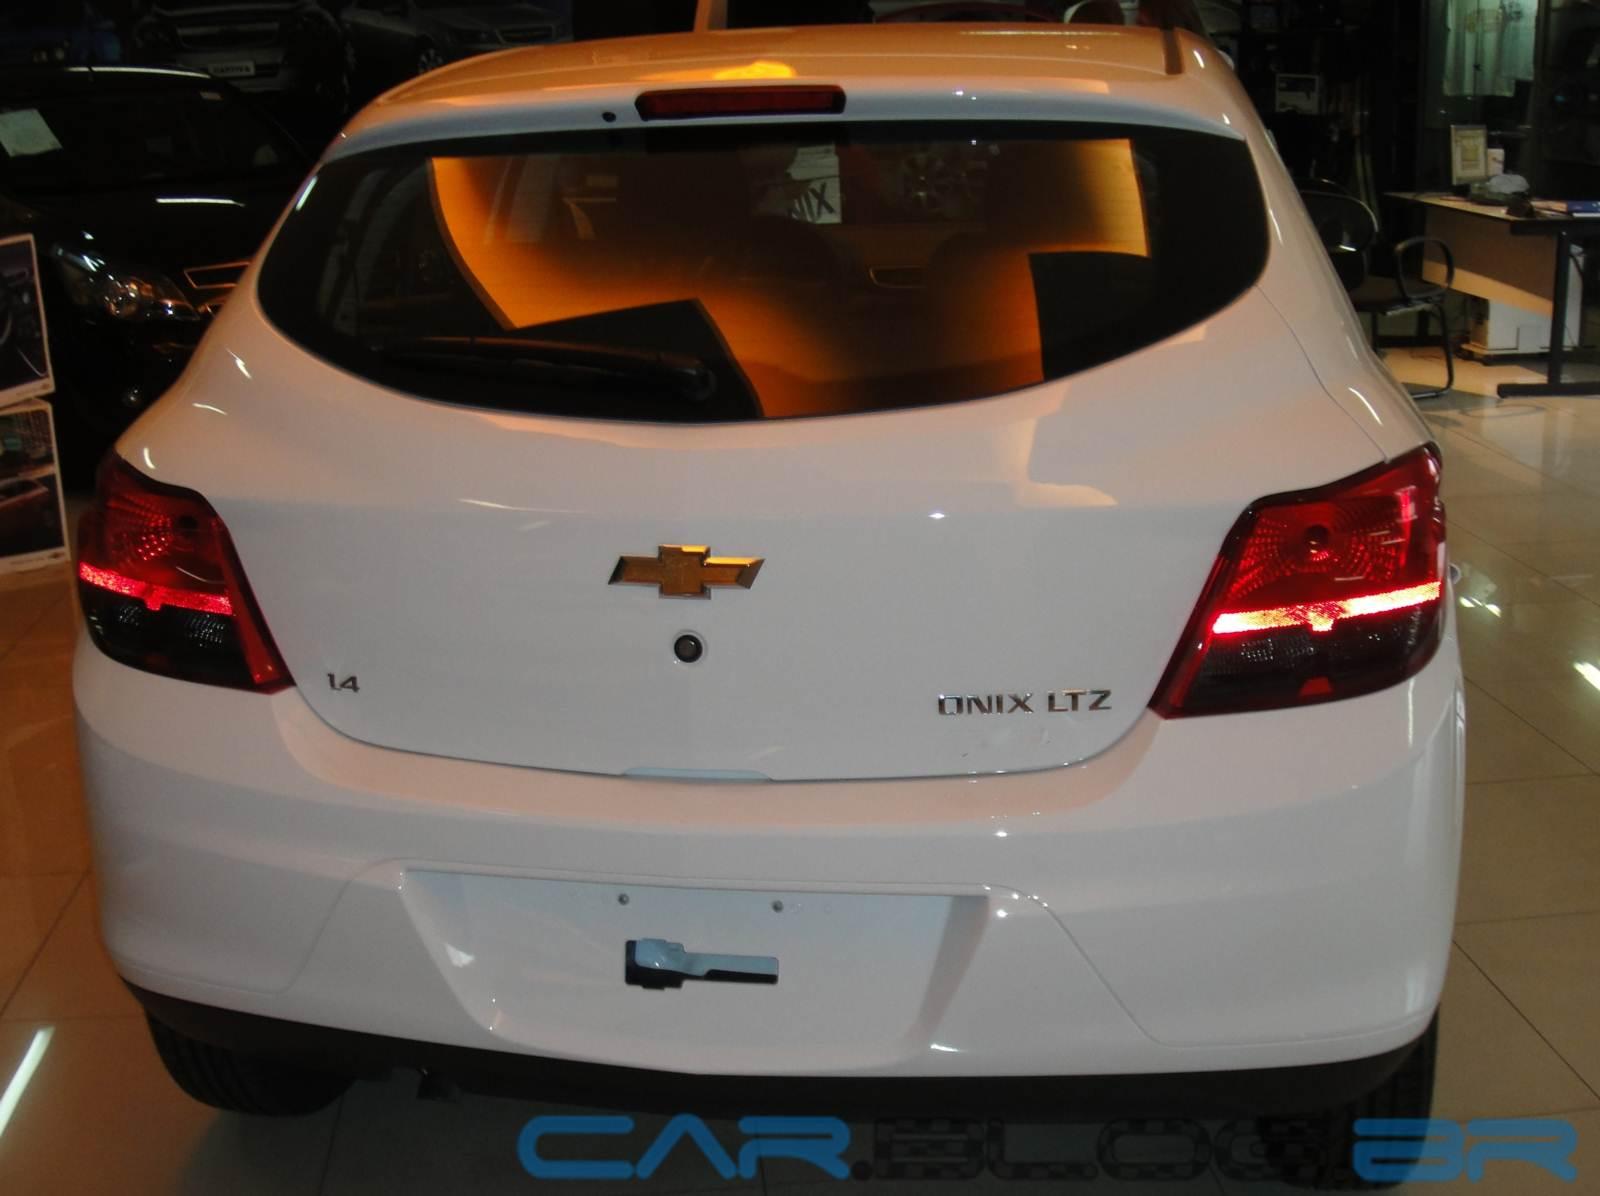 Chevrolet Onix Ltz 14 2013 Branco Traseira